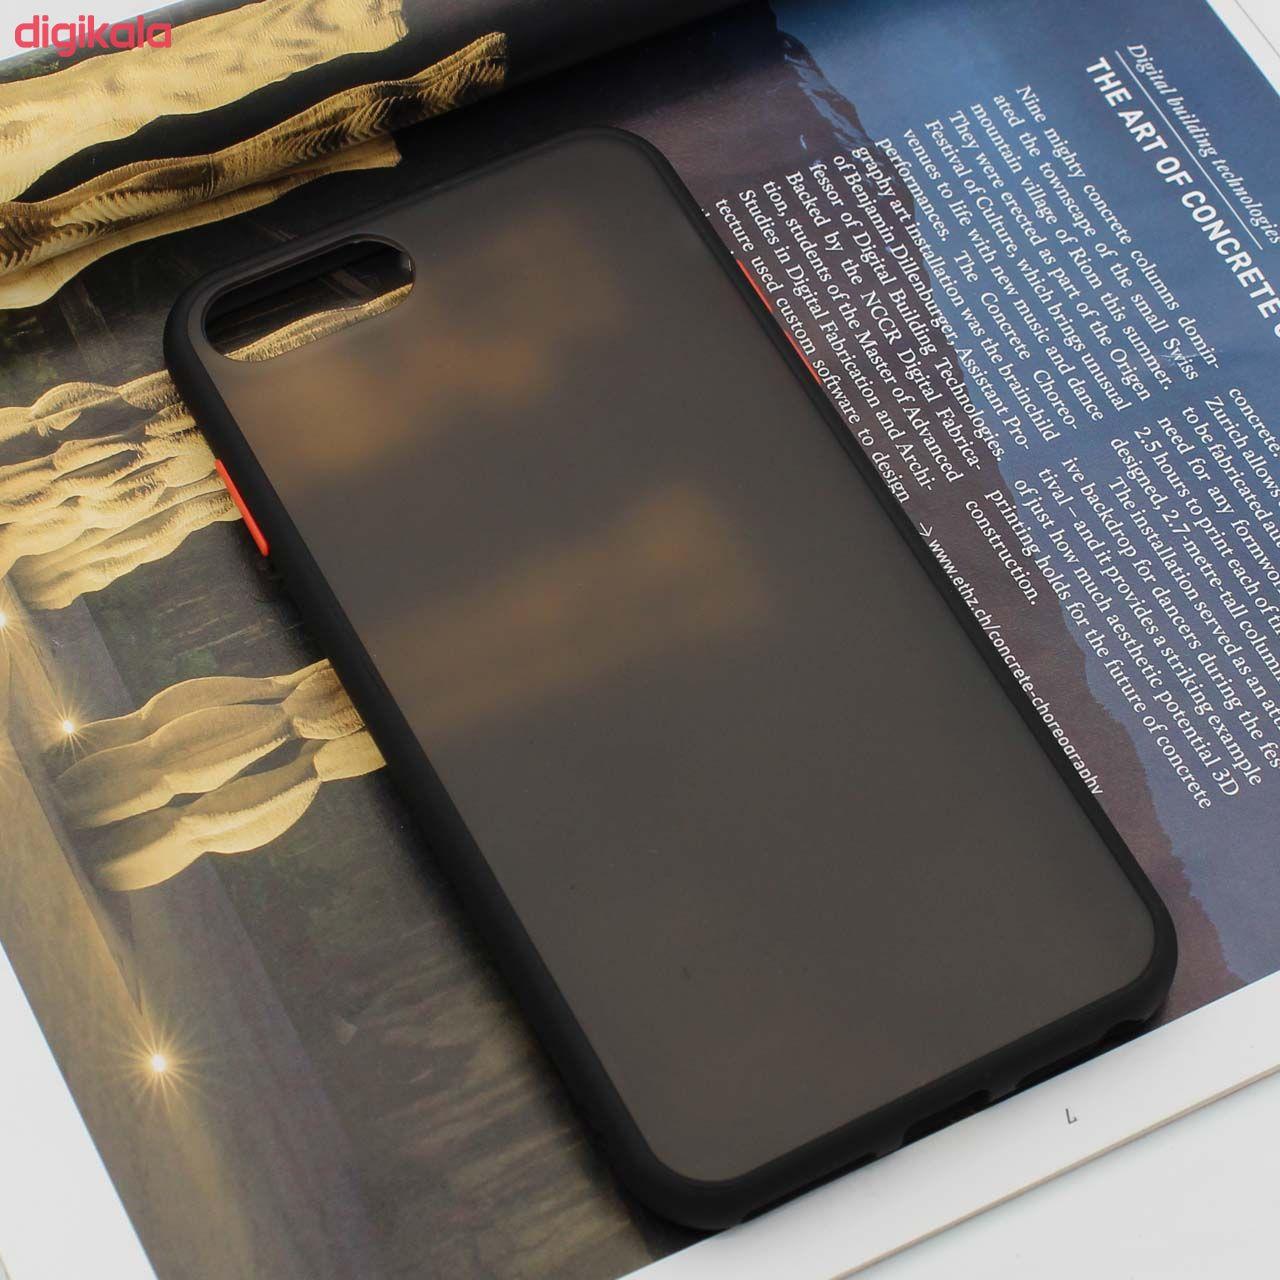 کاور کینگ پاور مدل M21 مناسب برای گوشی موبایل اپل iPhone 7 Plus/ 8 Plus main 1 4